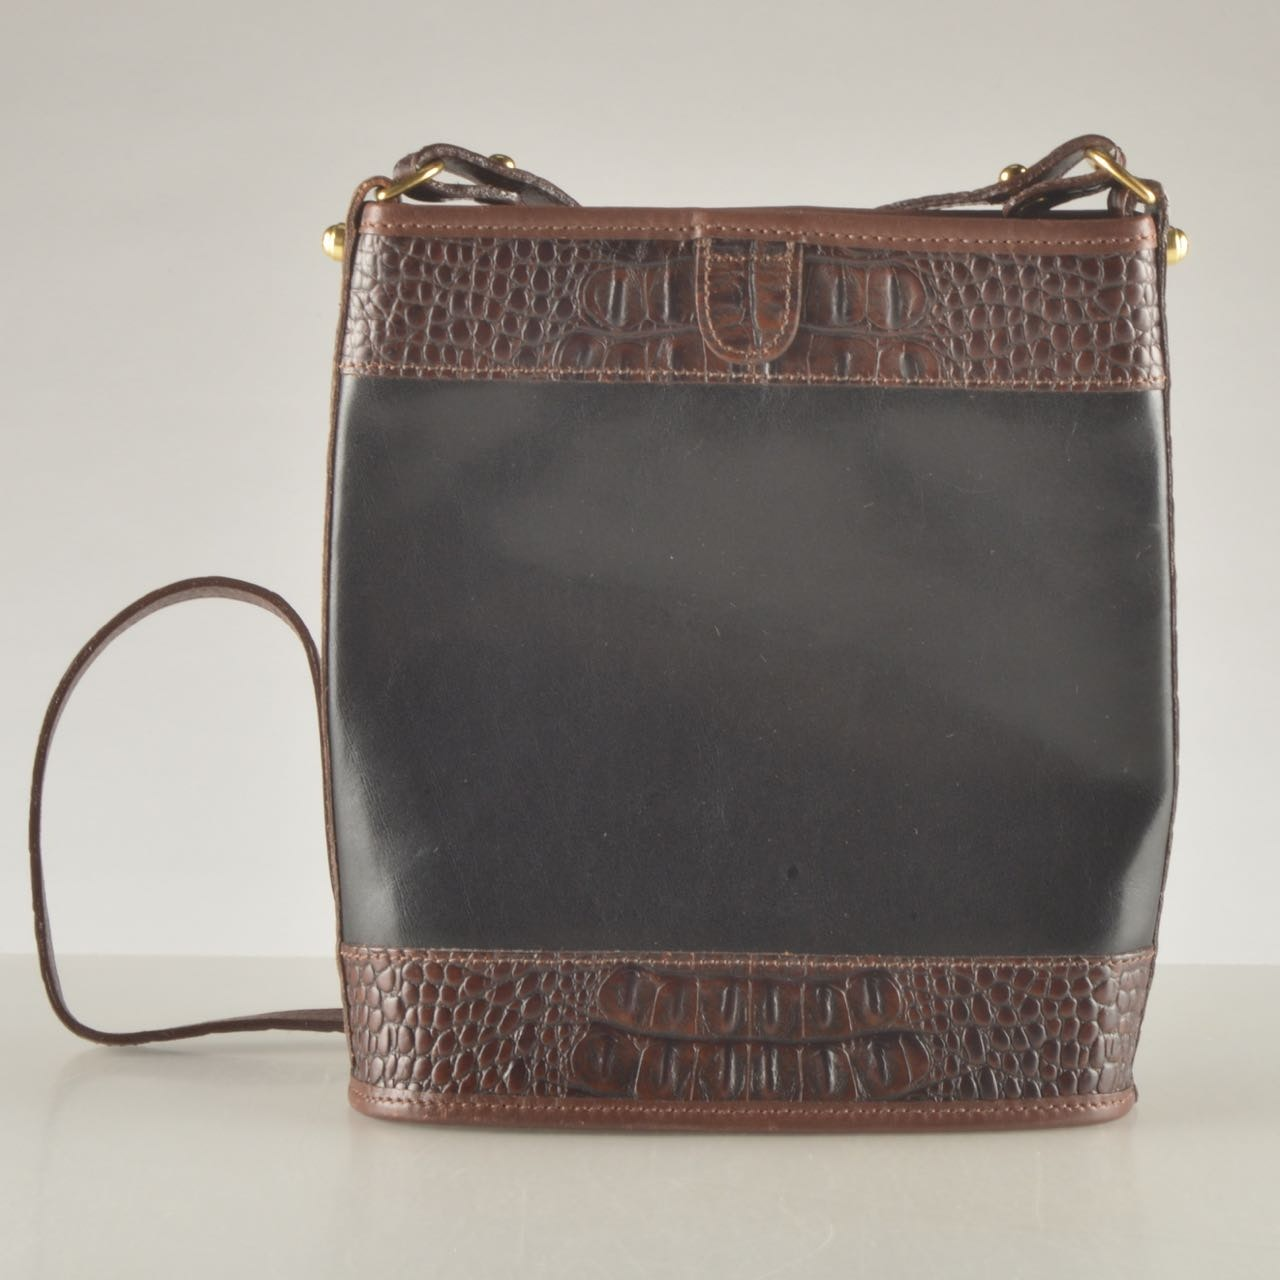 Brahmin Black and Brown Leather Cross-Body Handbag